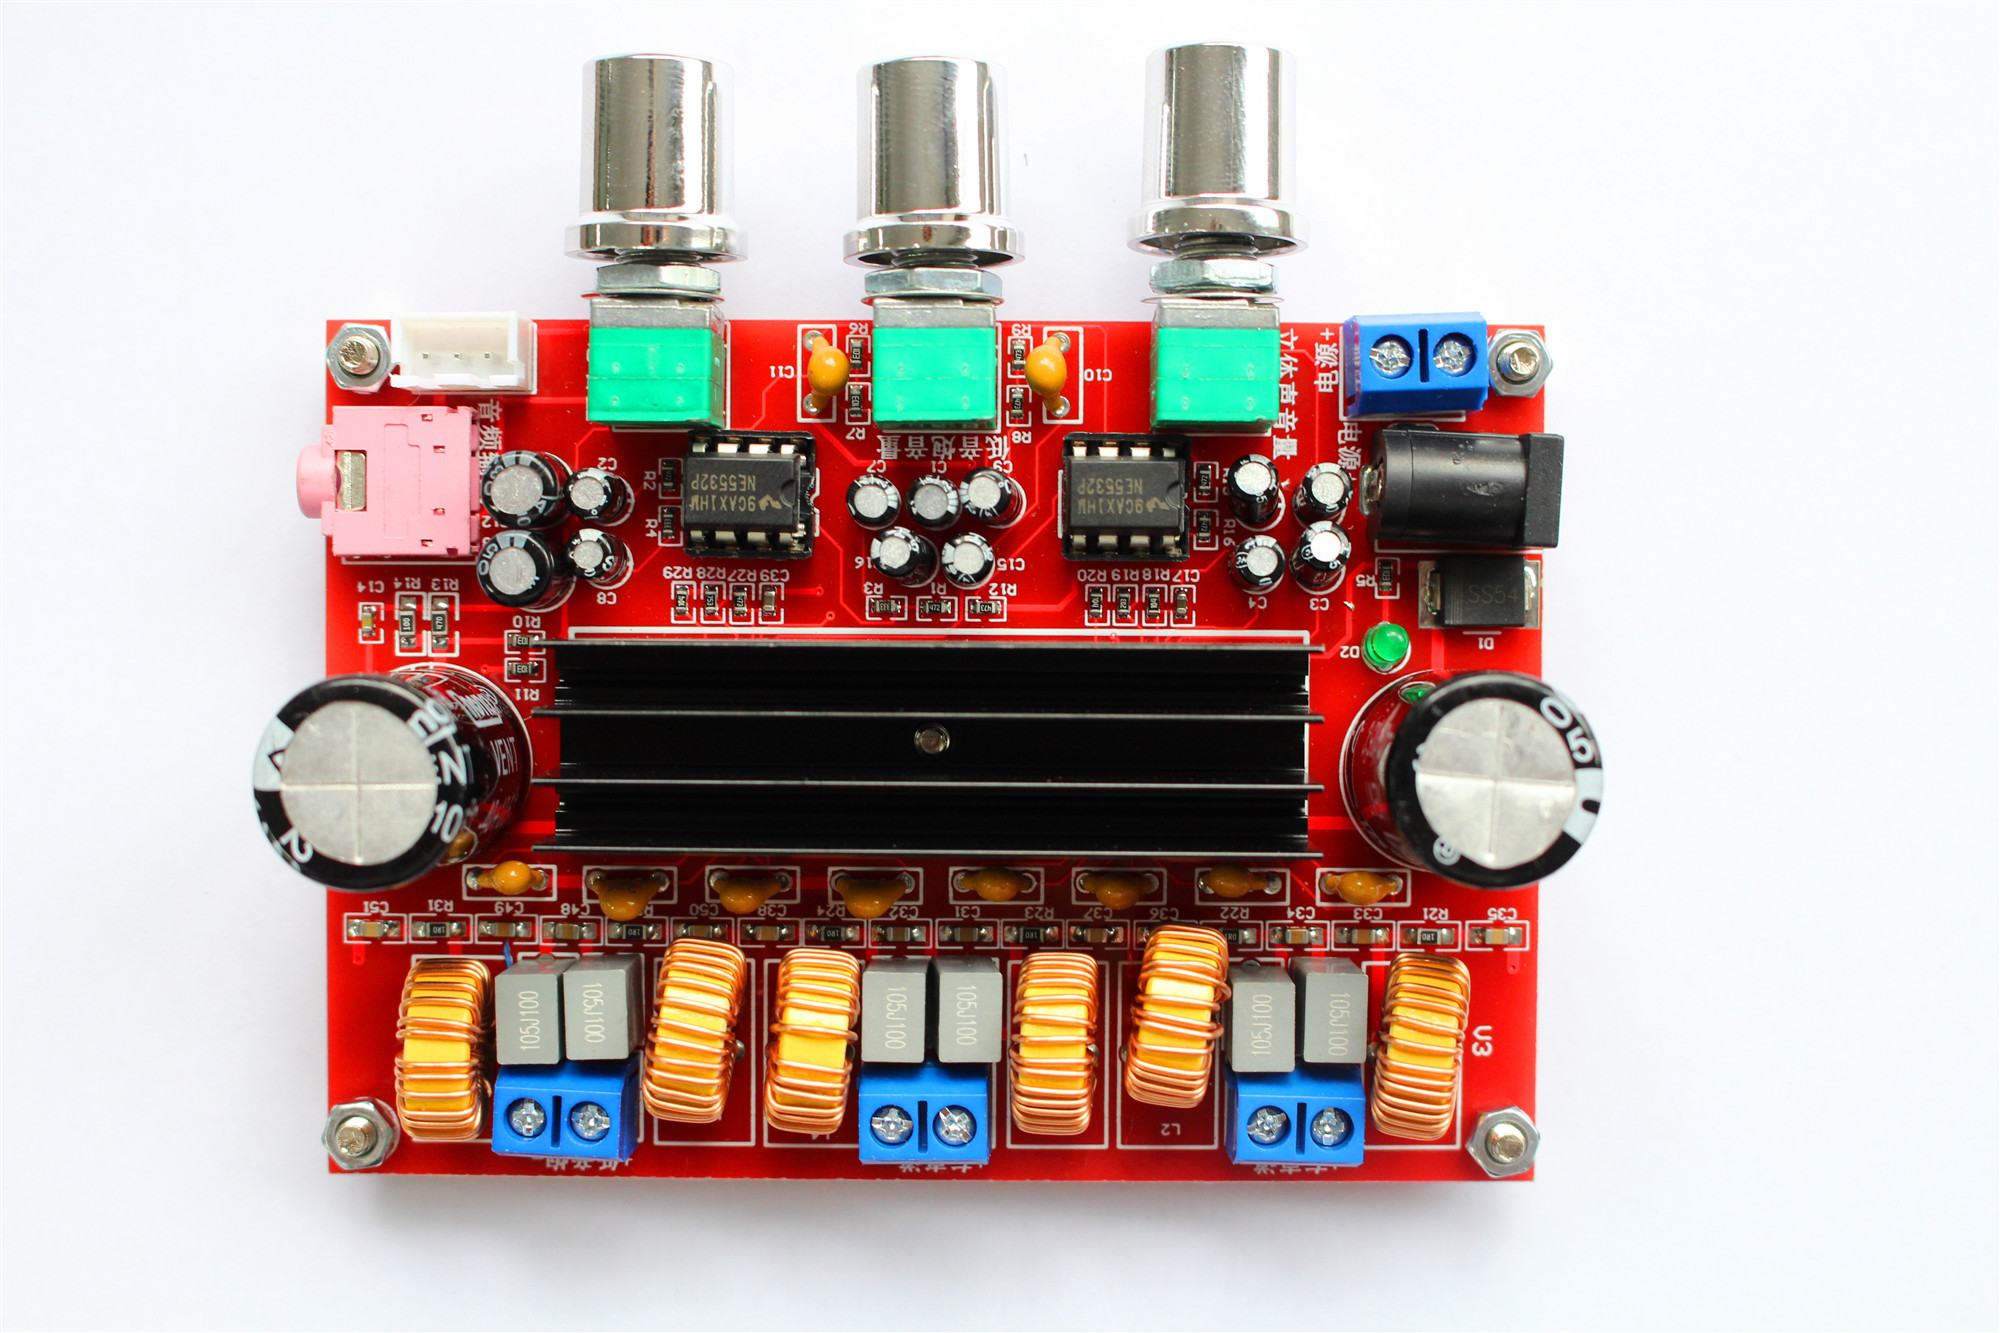 XH-M139 2.1 Channel Digital Power Amplifier Board 12v-24v Wide Voltage TPA3116D2 2*50W 100W